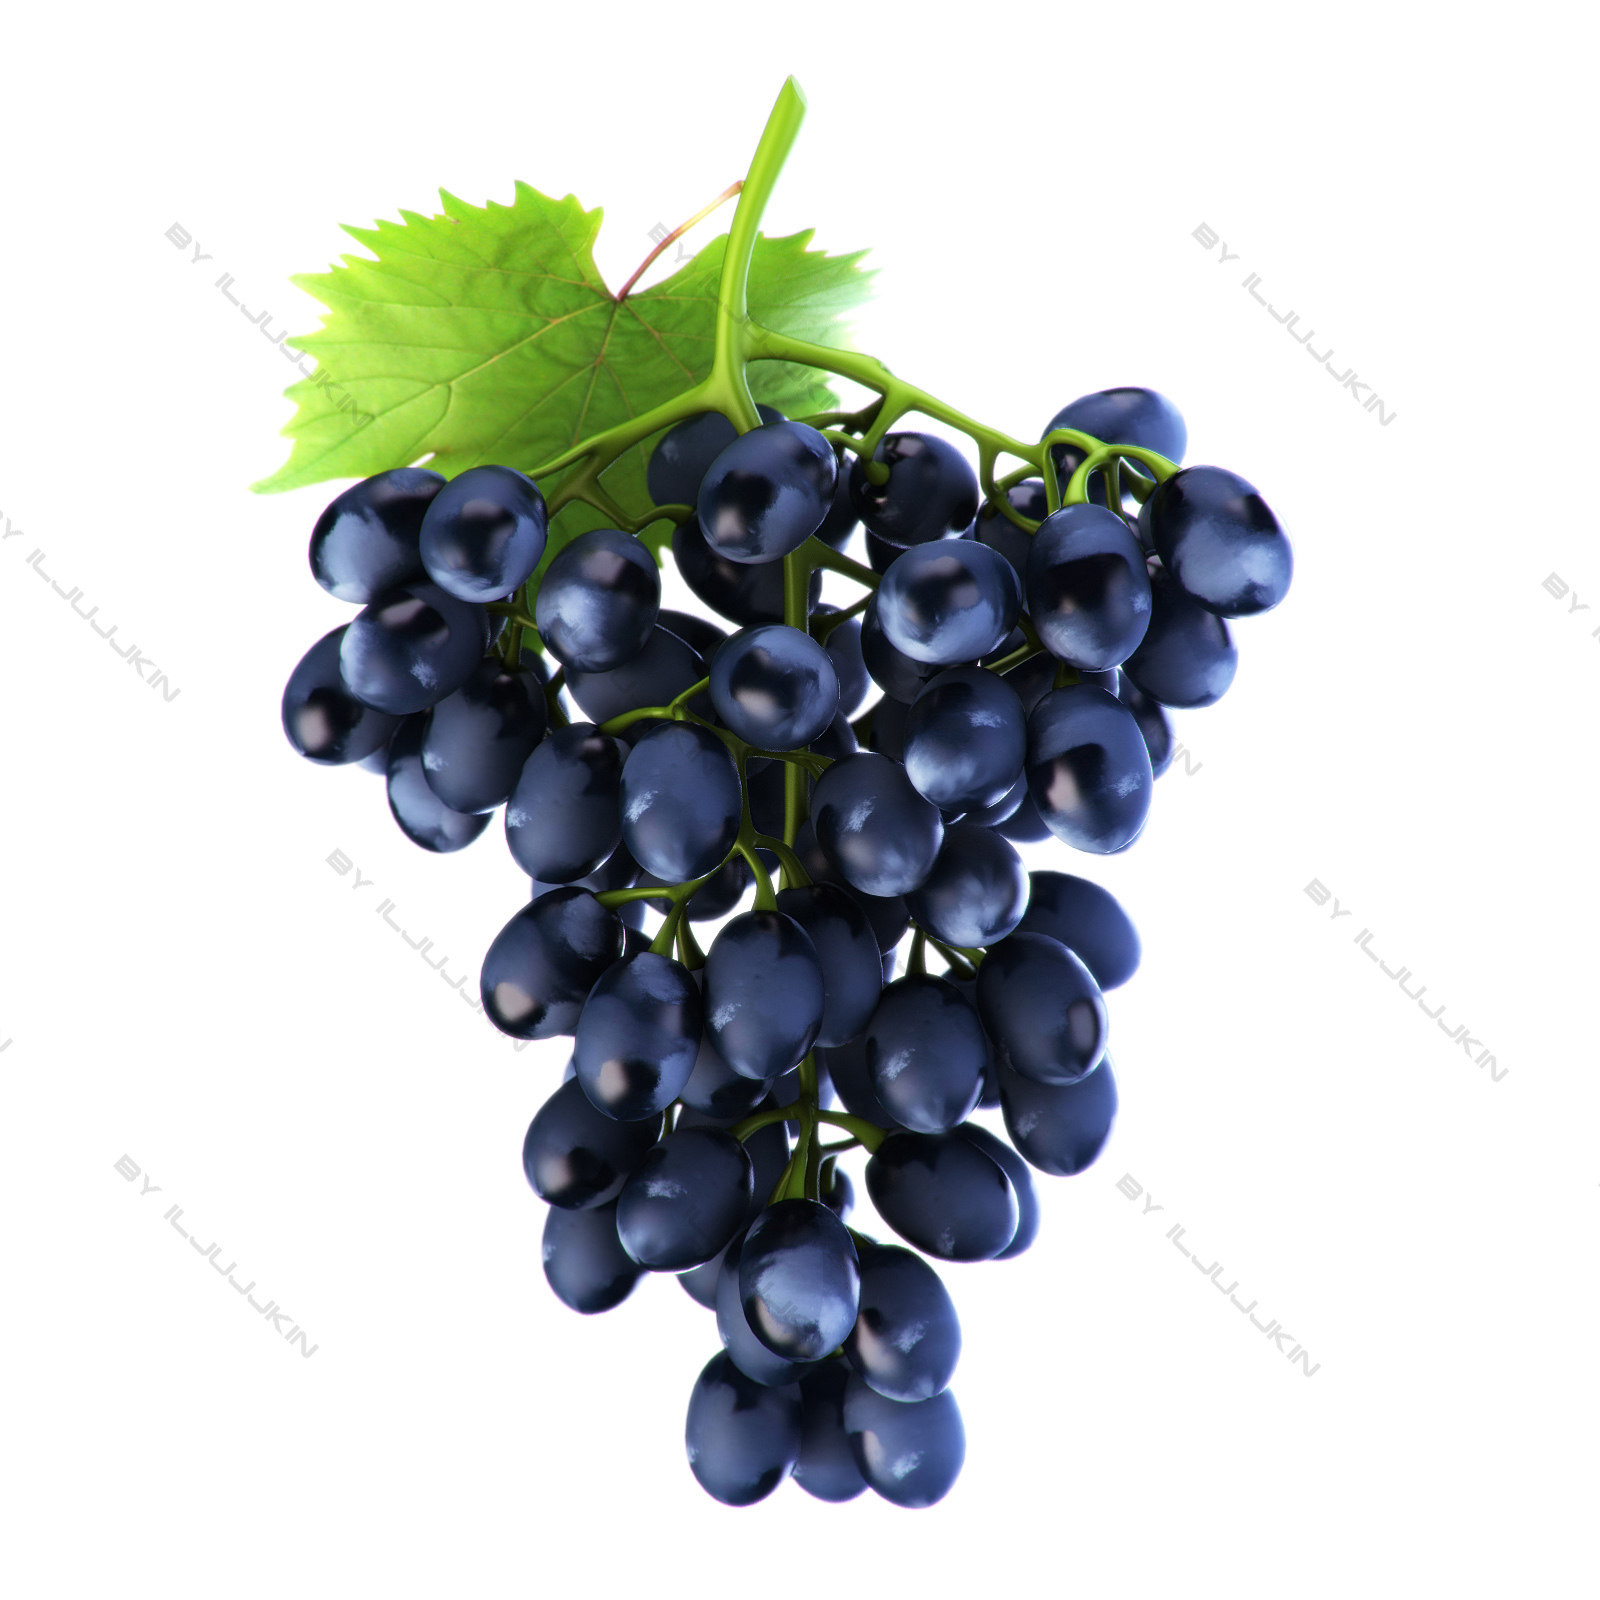 Grapes_blue_01.jpg